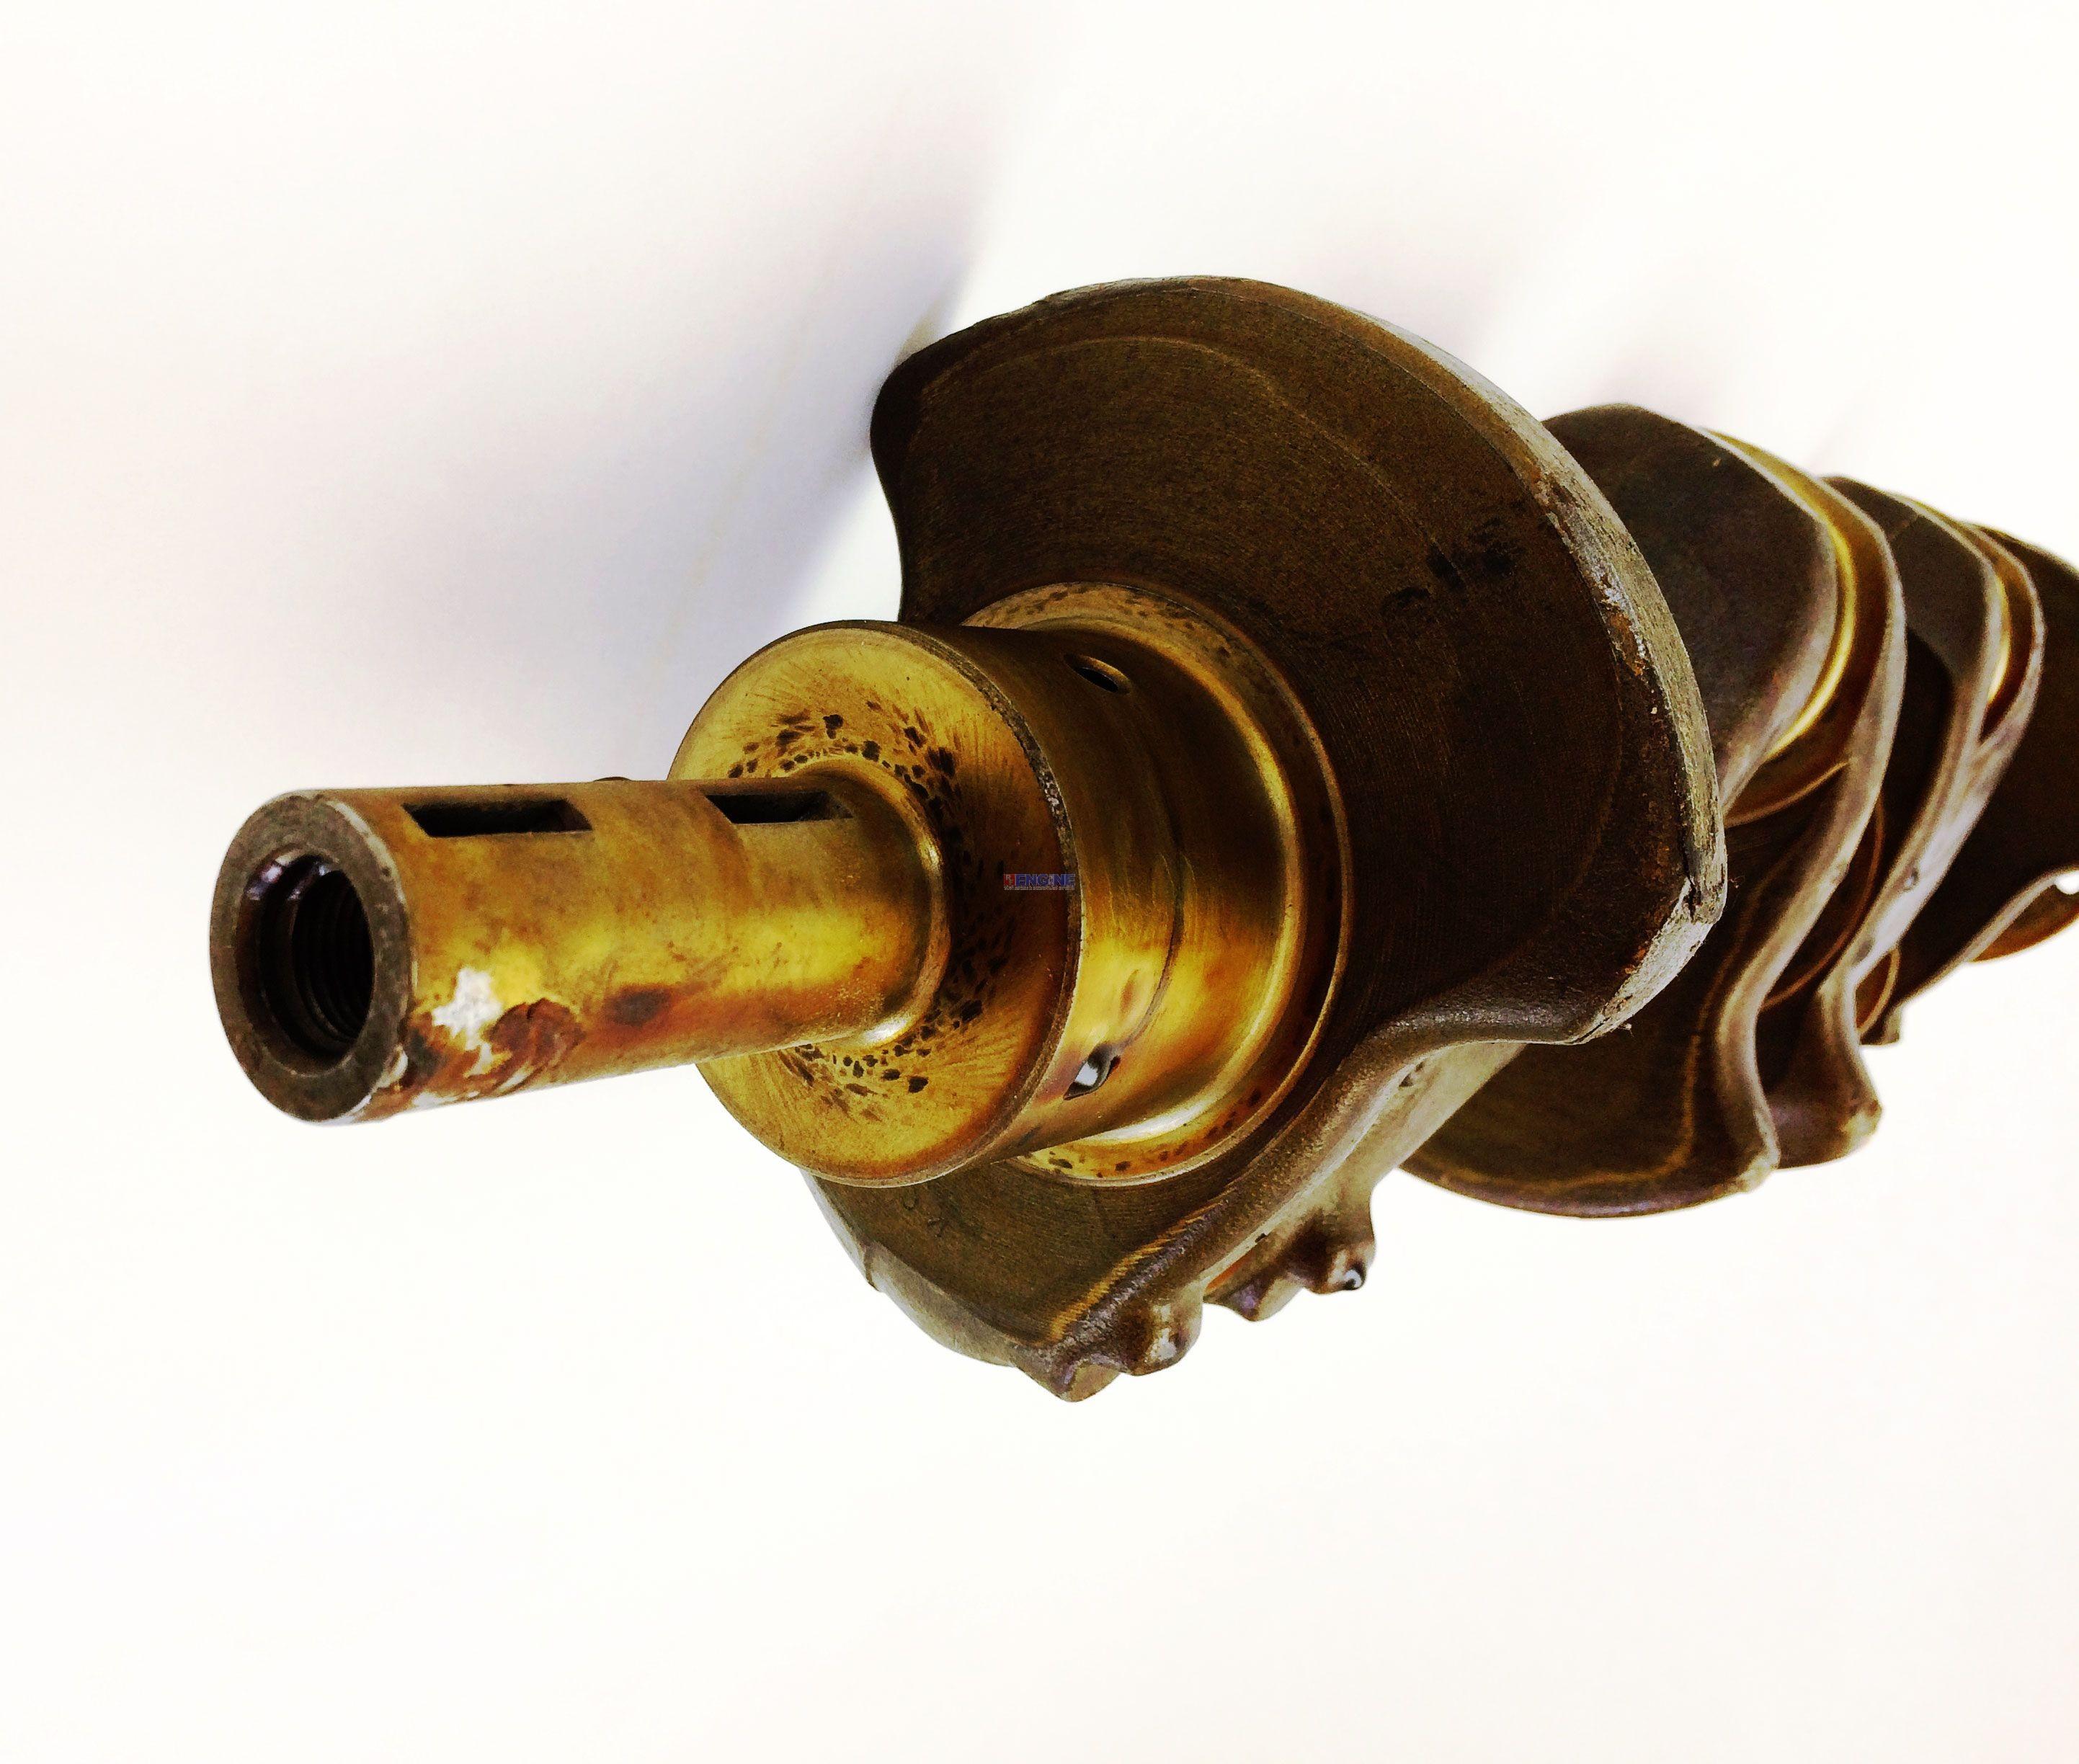 R. F. Engine Massey Ferguson Crankshaft 0.ST Rods / 0.ST Mains 4 ...